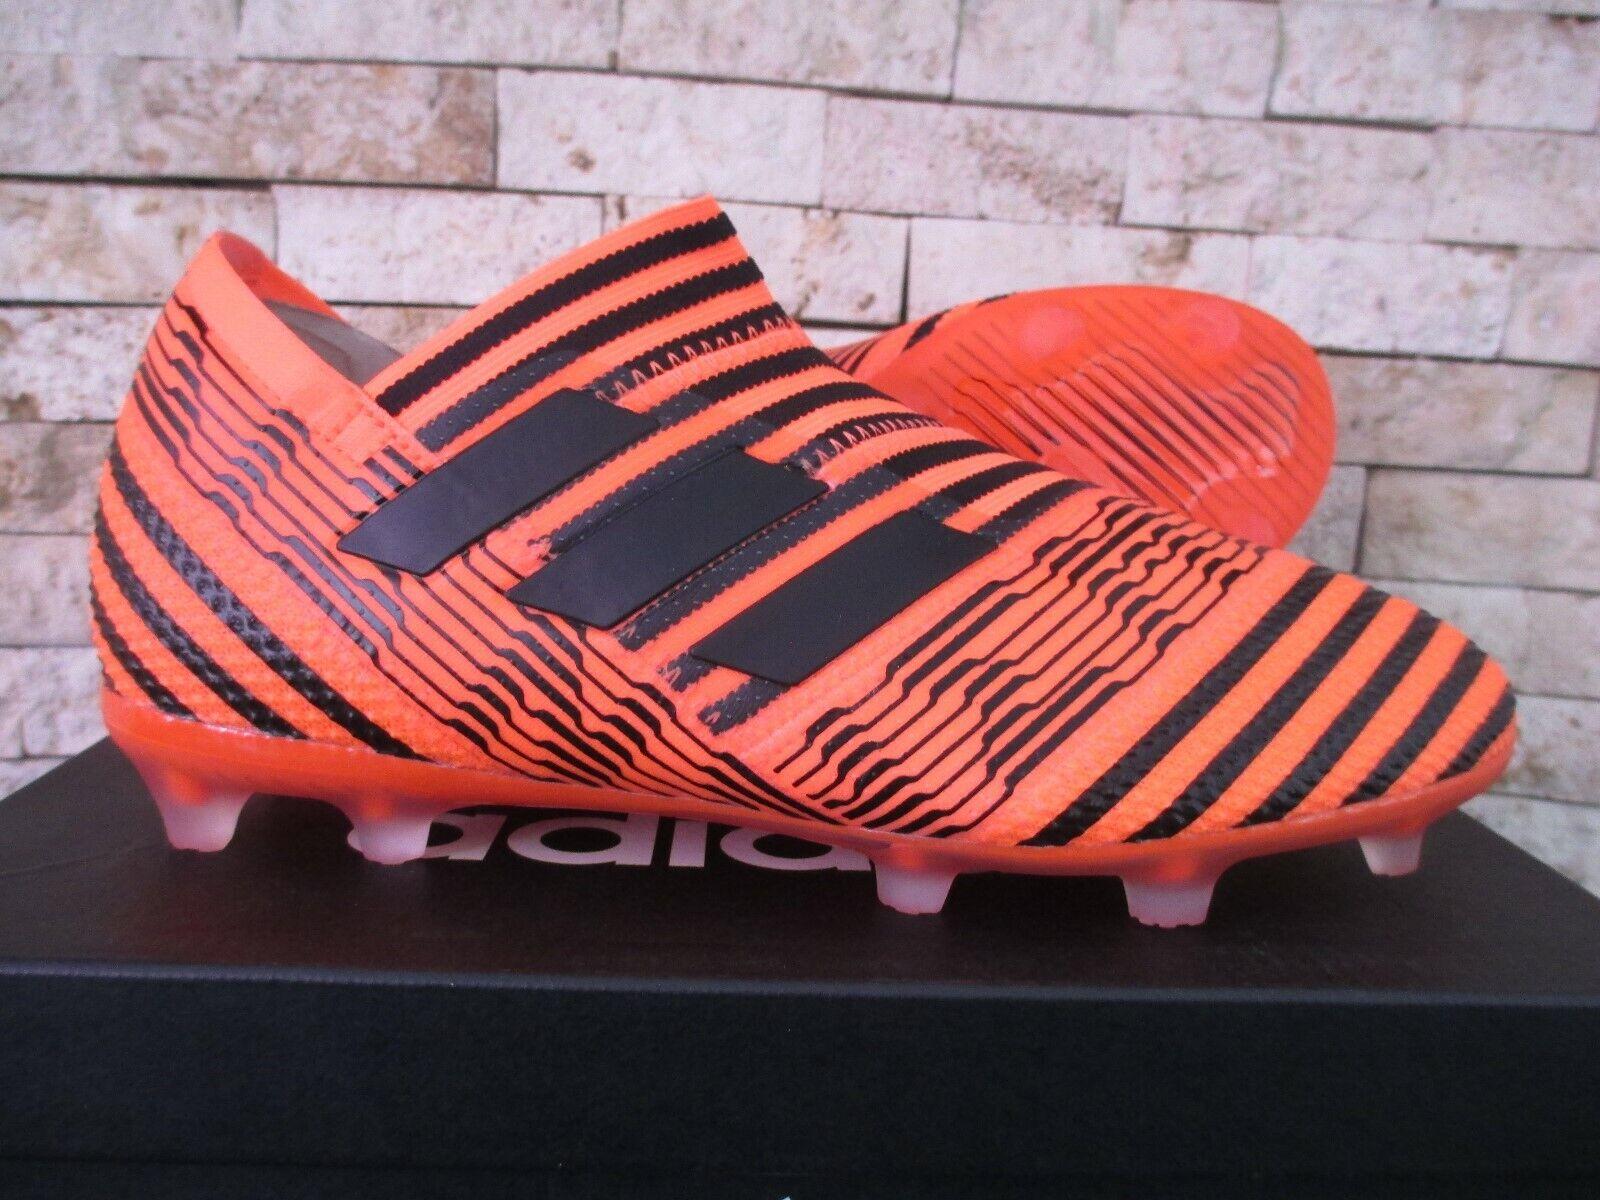 Adidas NEMEZIZ 17+ FG 360 Agility Fußballschuhe Kinder NP 199,95 € Größe 38